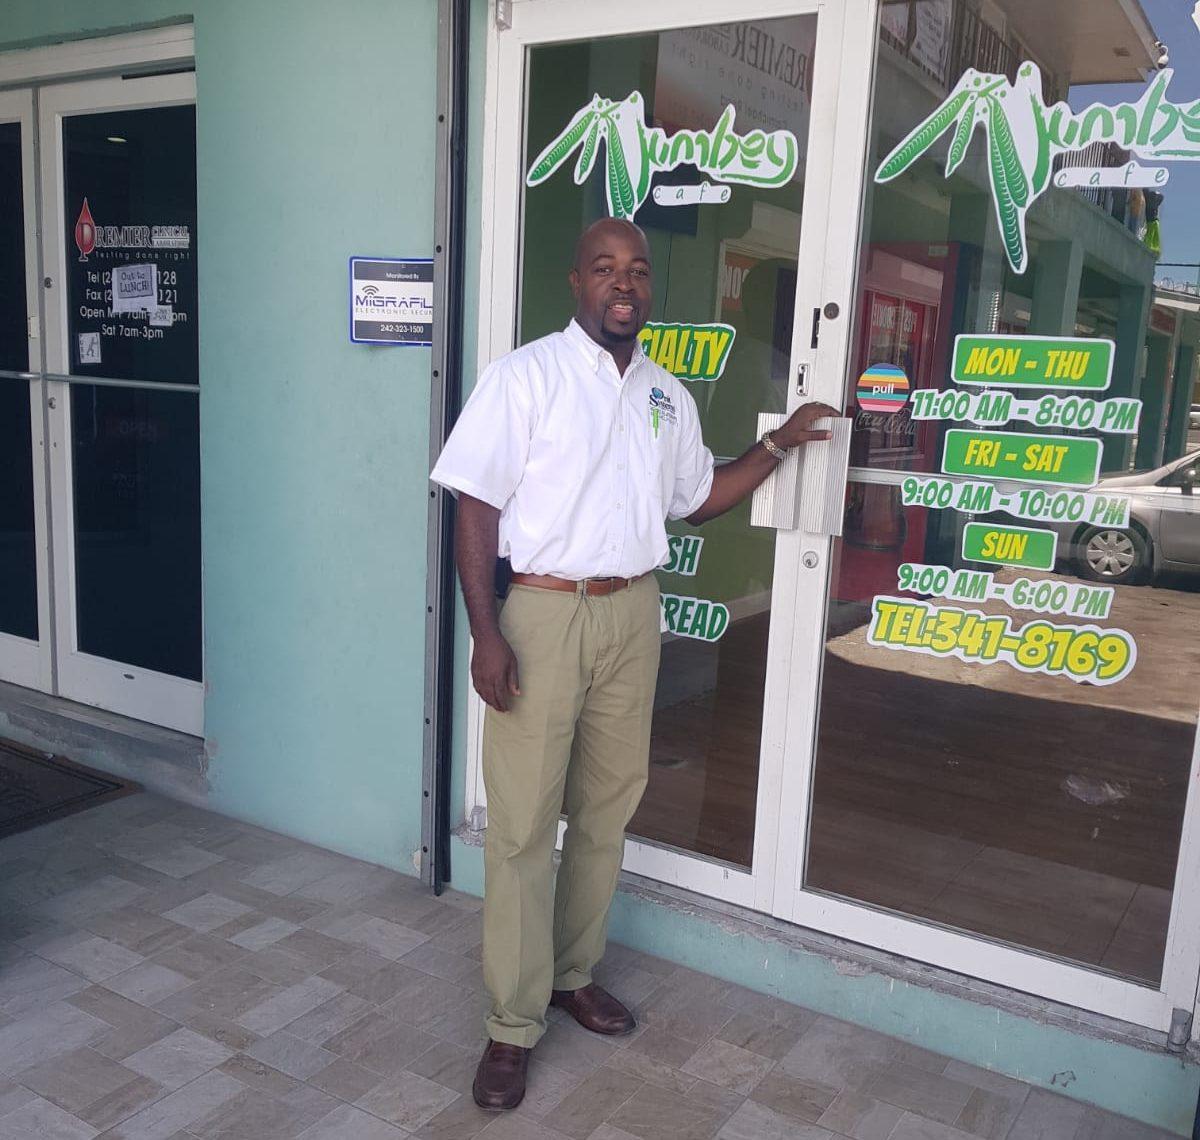 Jumbey Café Carmichael opens its doors